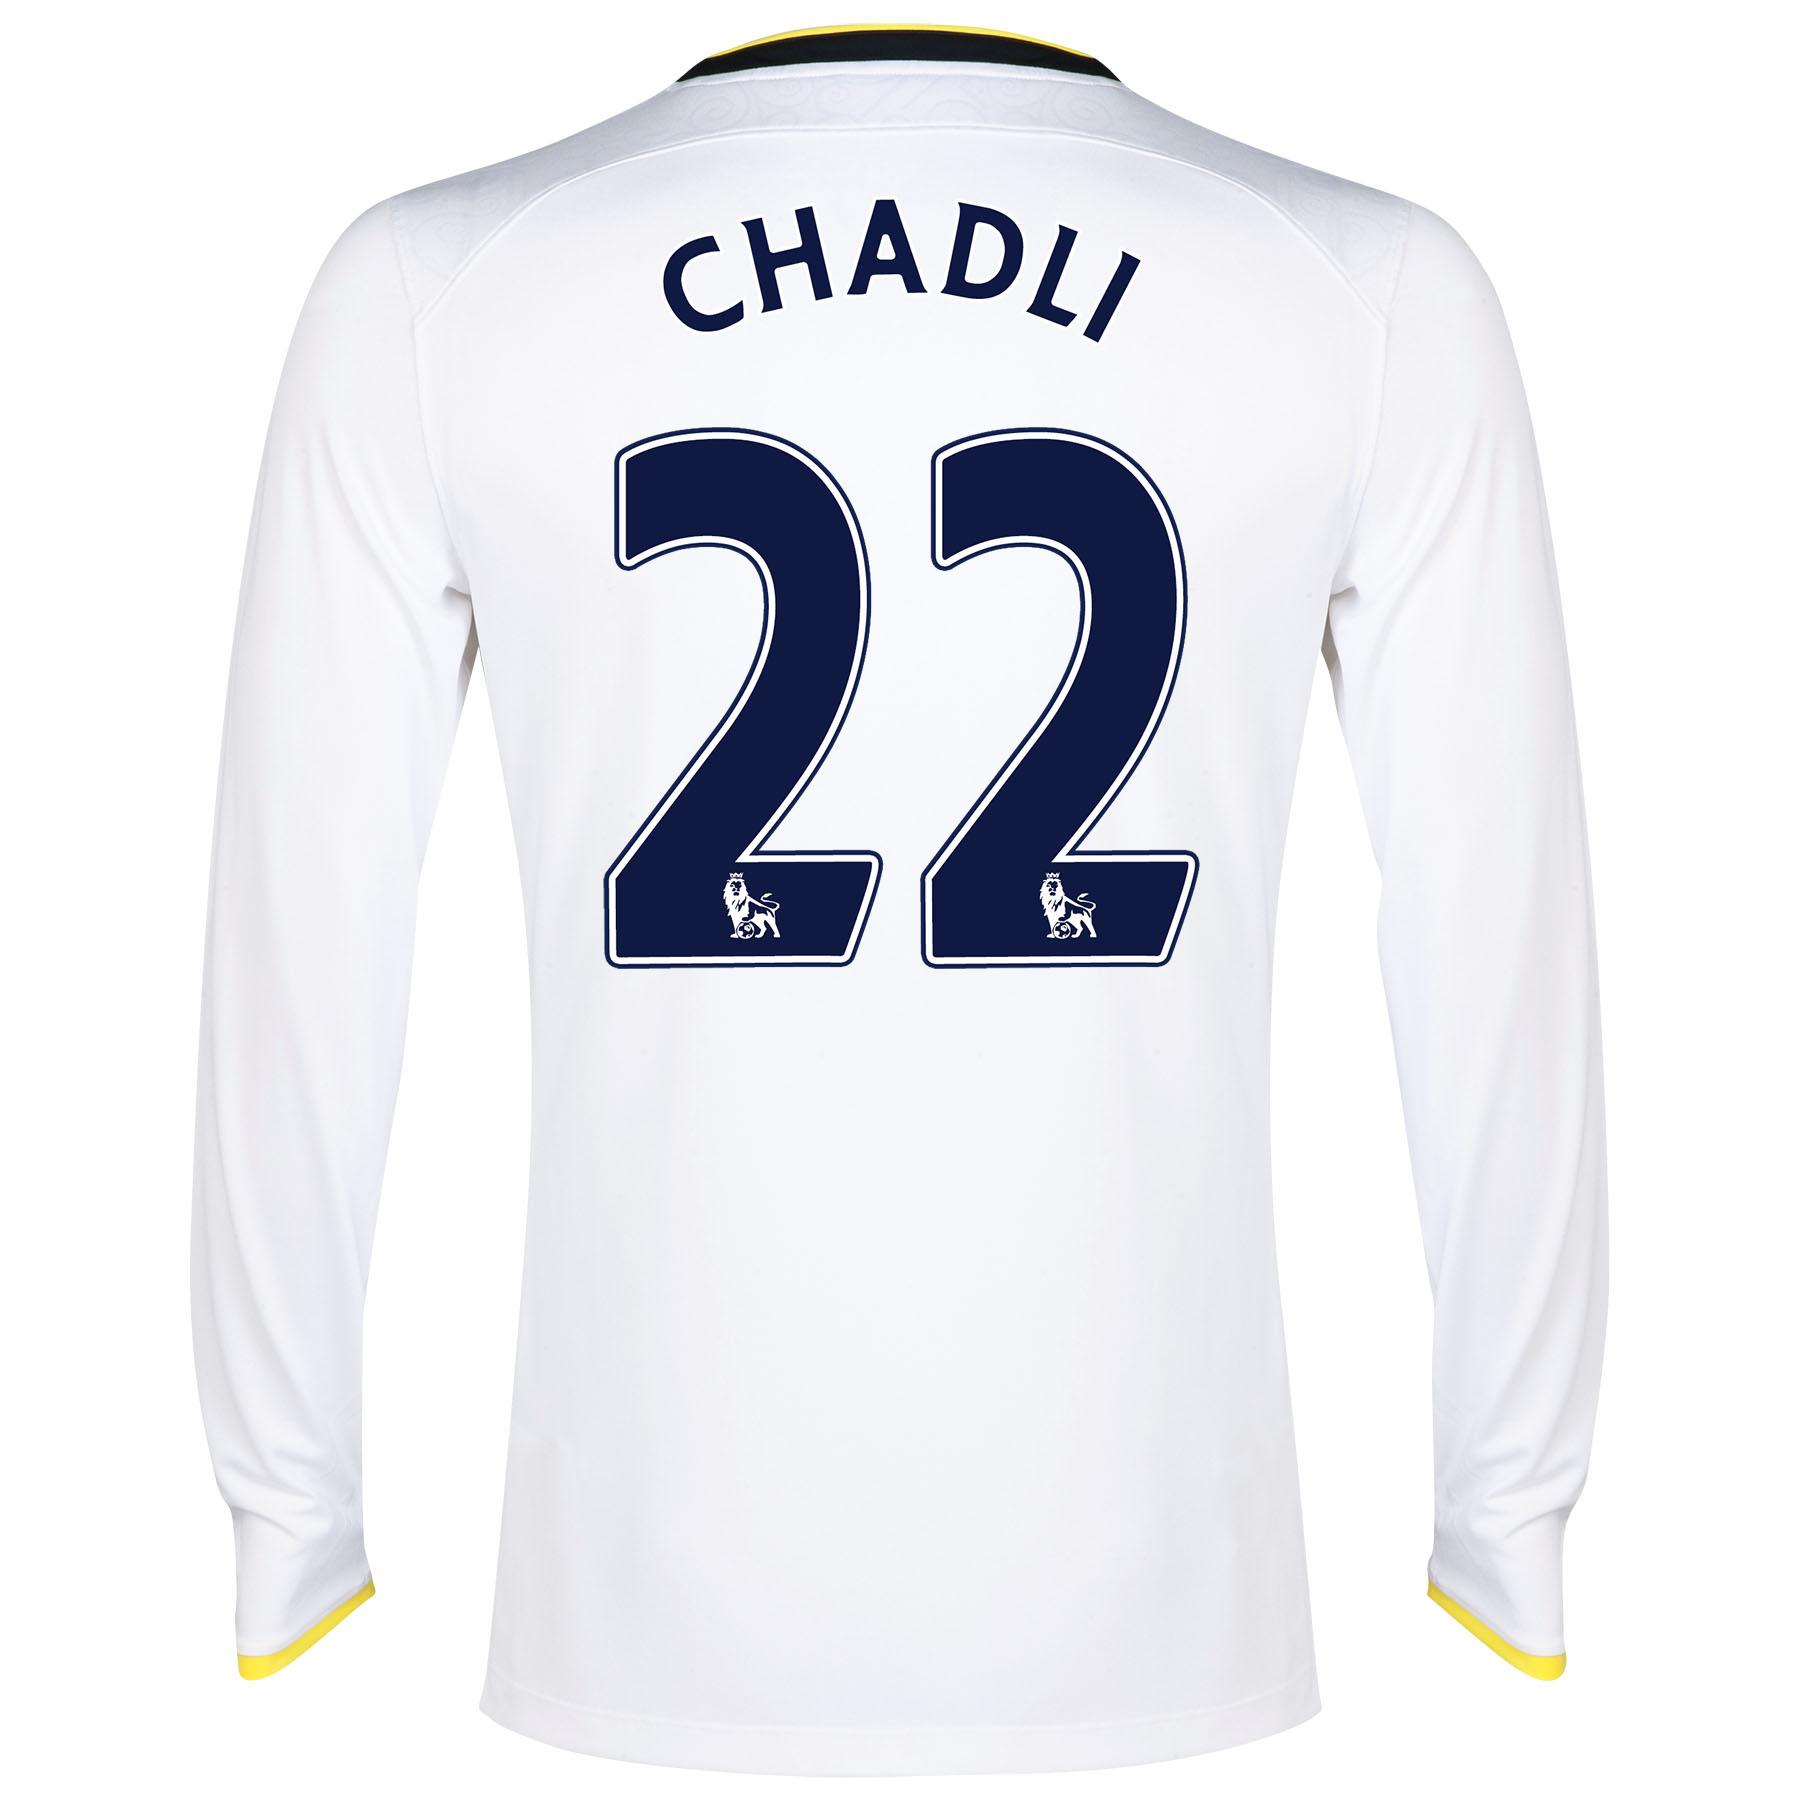 Tottenham Hotspur Home Shirt 2014/15 - Long Sleeve with Chadli 21 printing